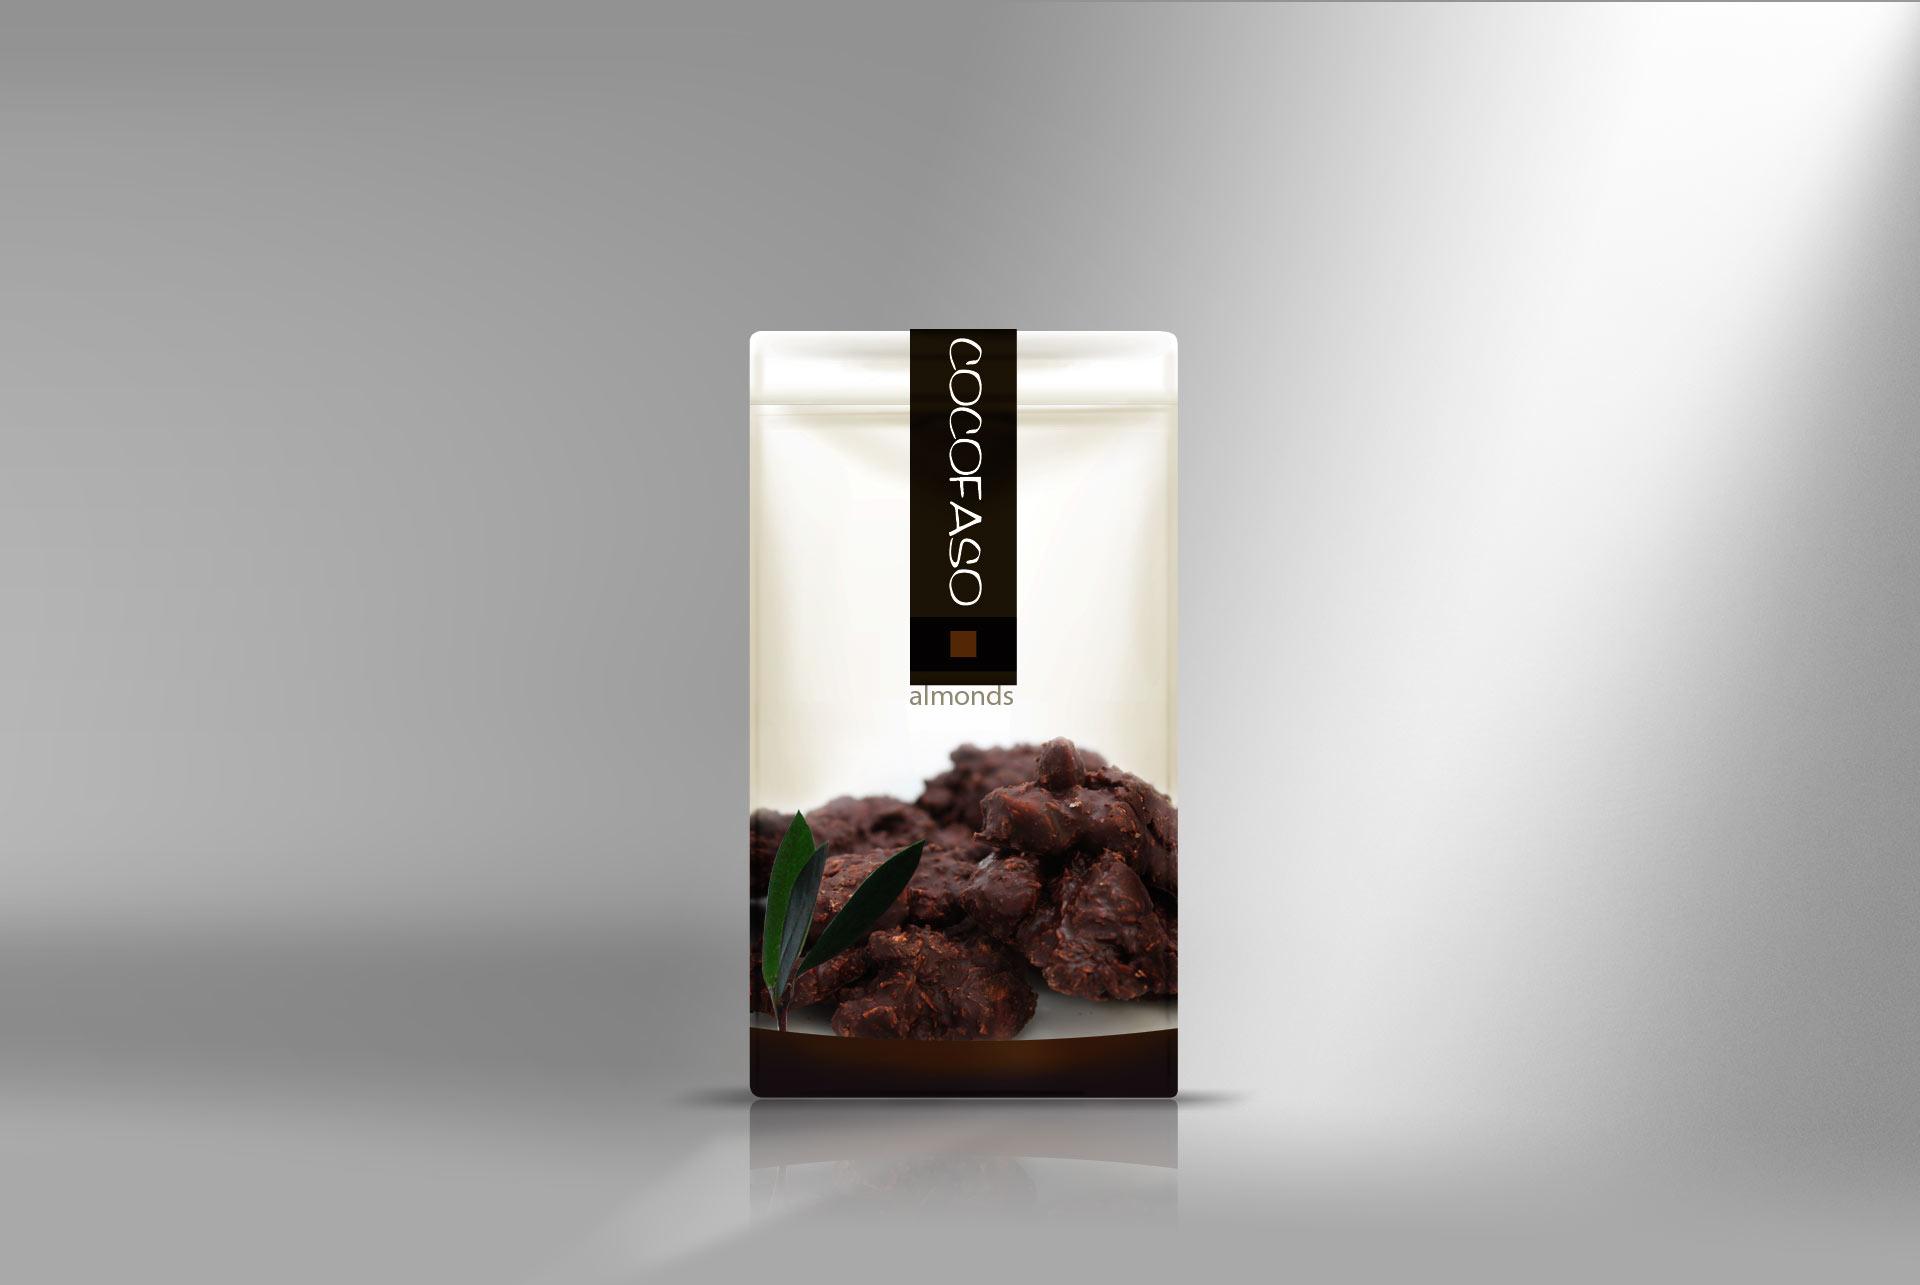 chocolate packaging designer.